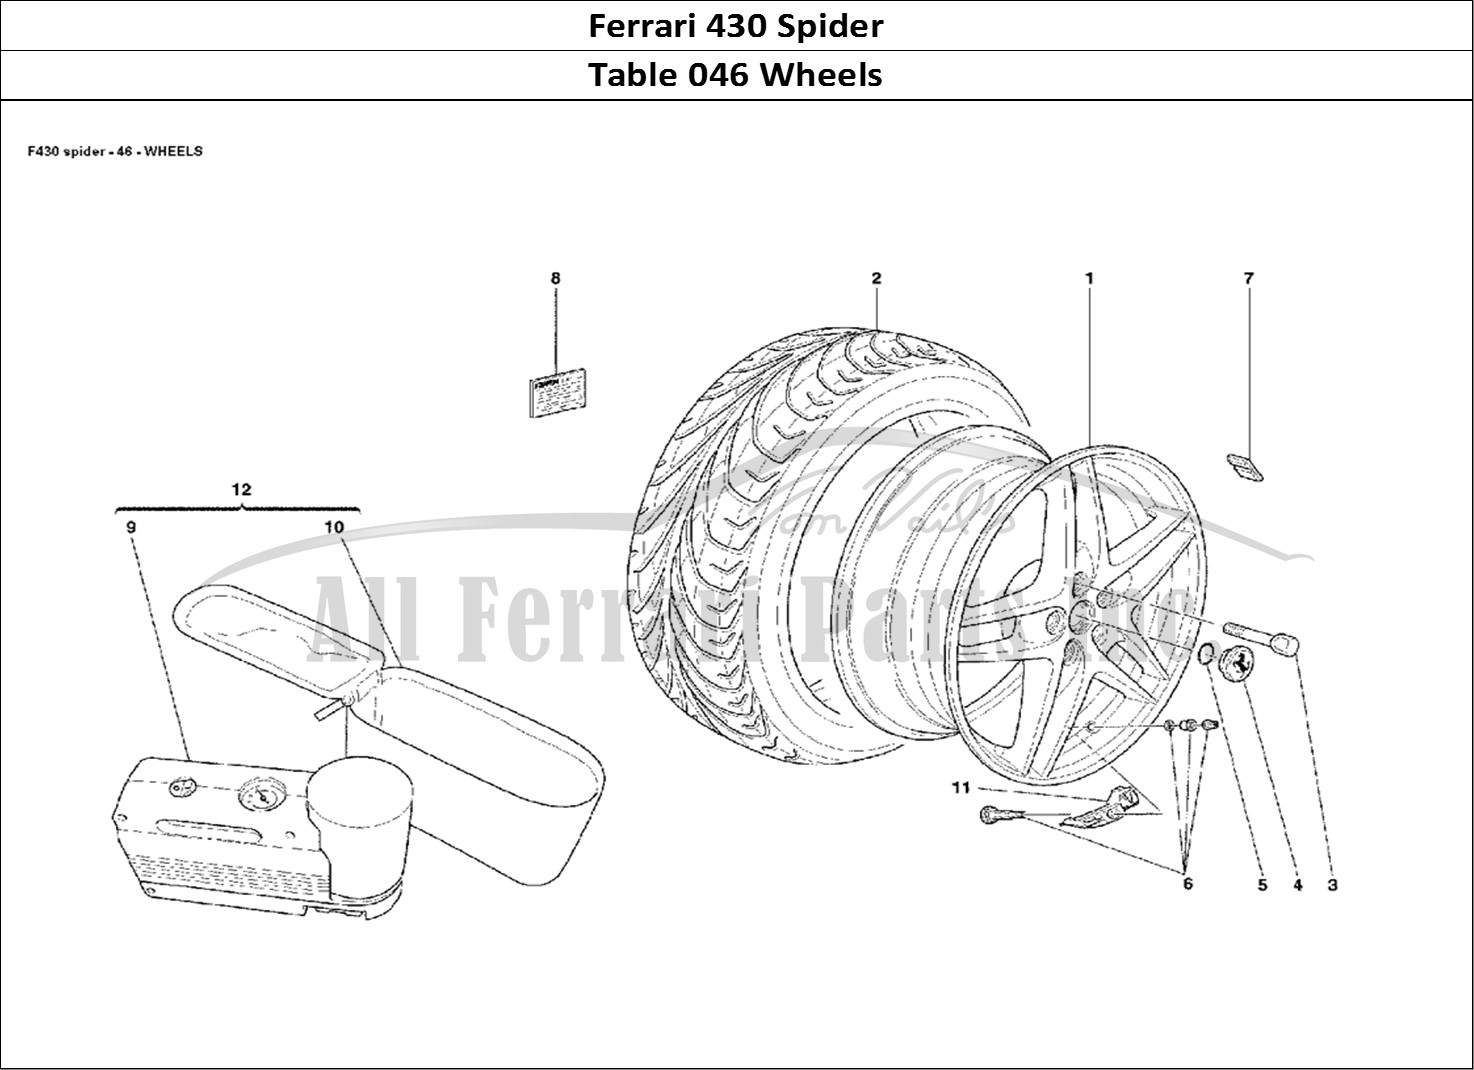 Buy original Ferrari 430 Spider 046 Wheels Ferrari parts